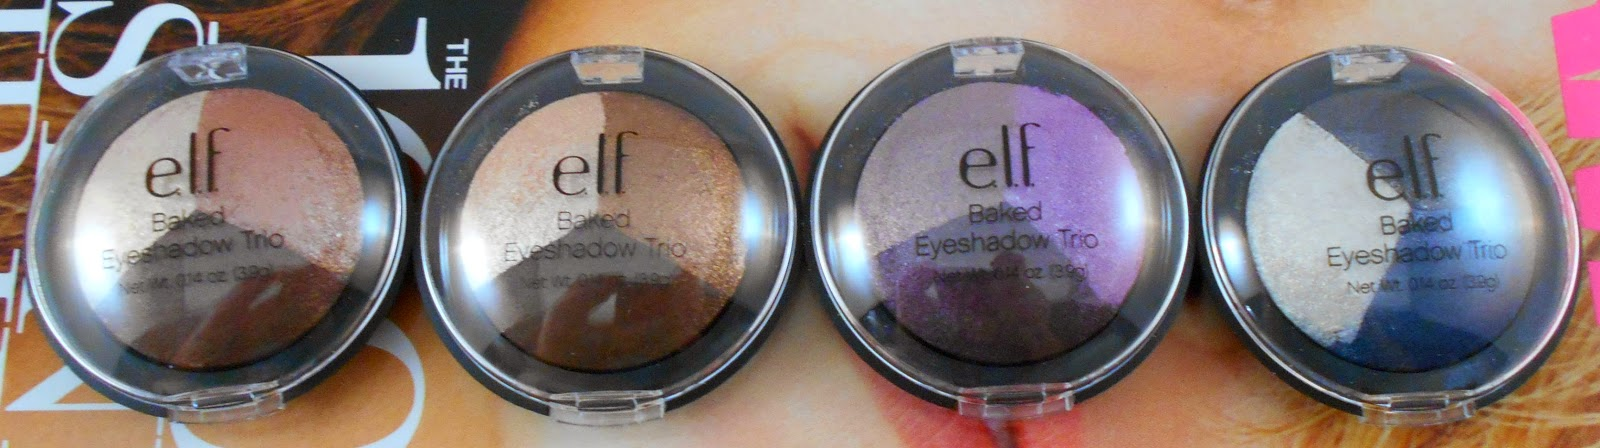 E.L.F Studio Baked Eyeshadow Trios